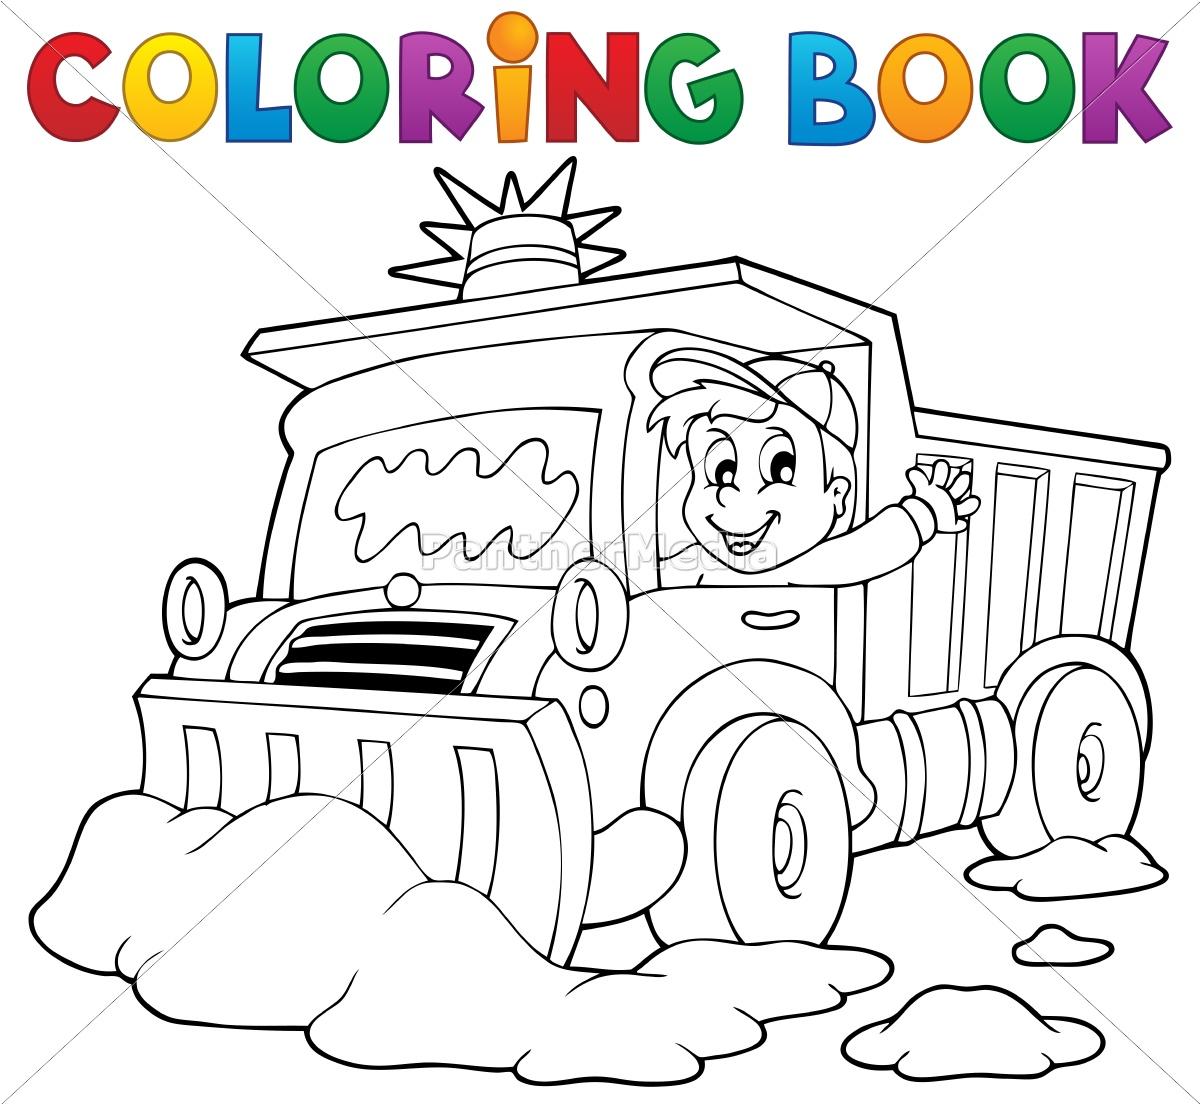 coloring, book, snow, plough - 10221471